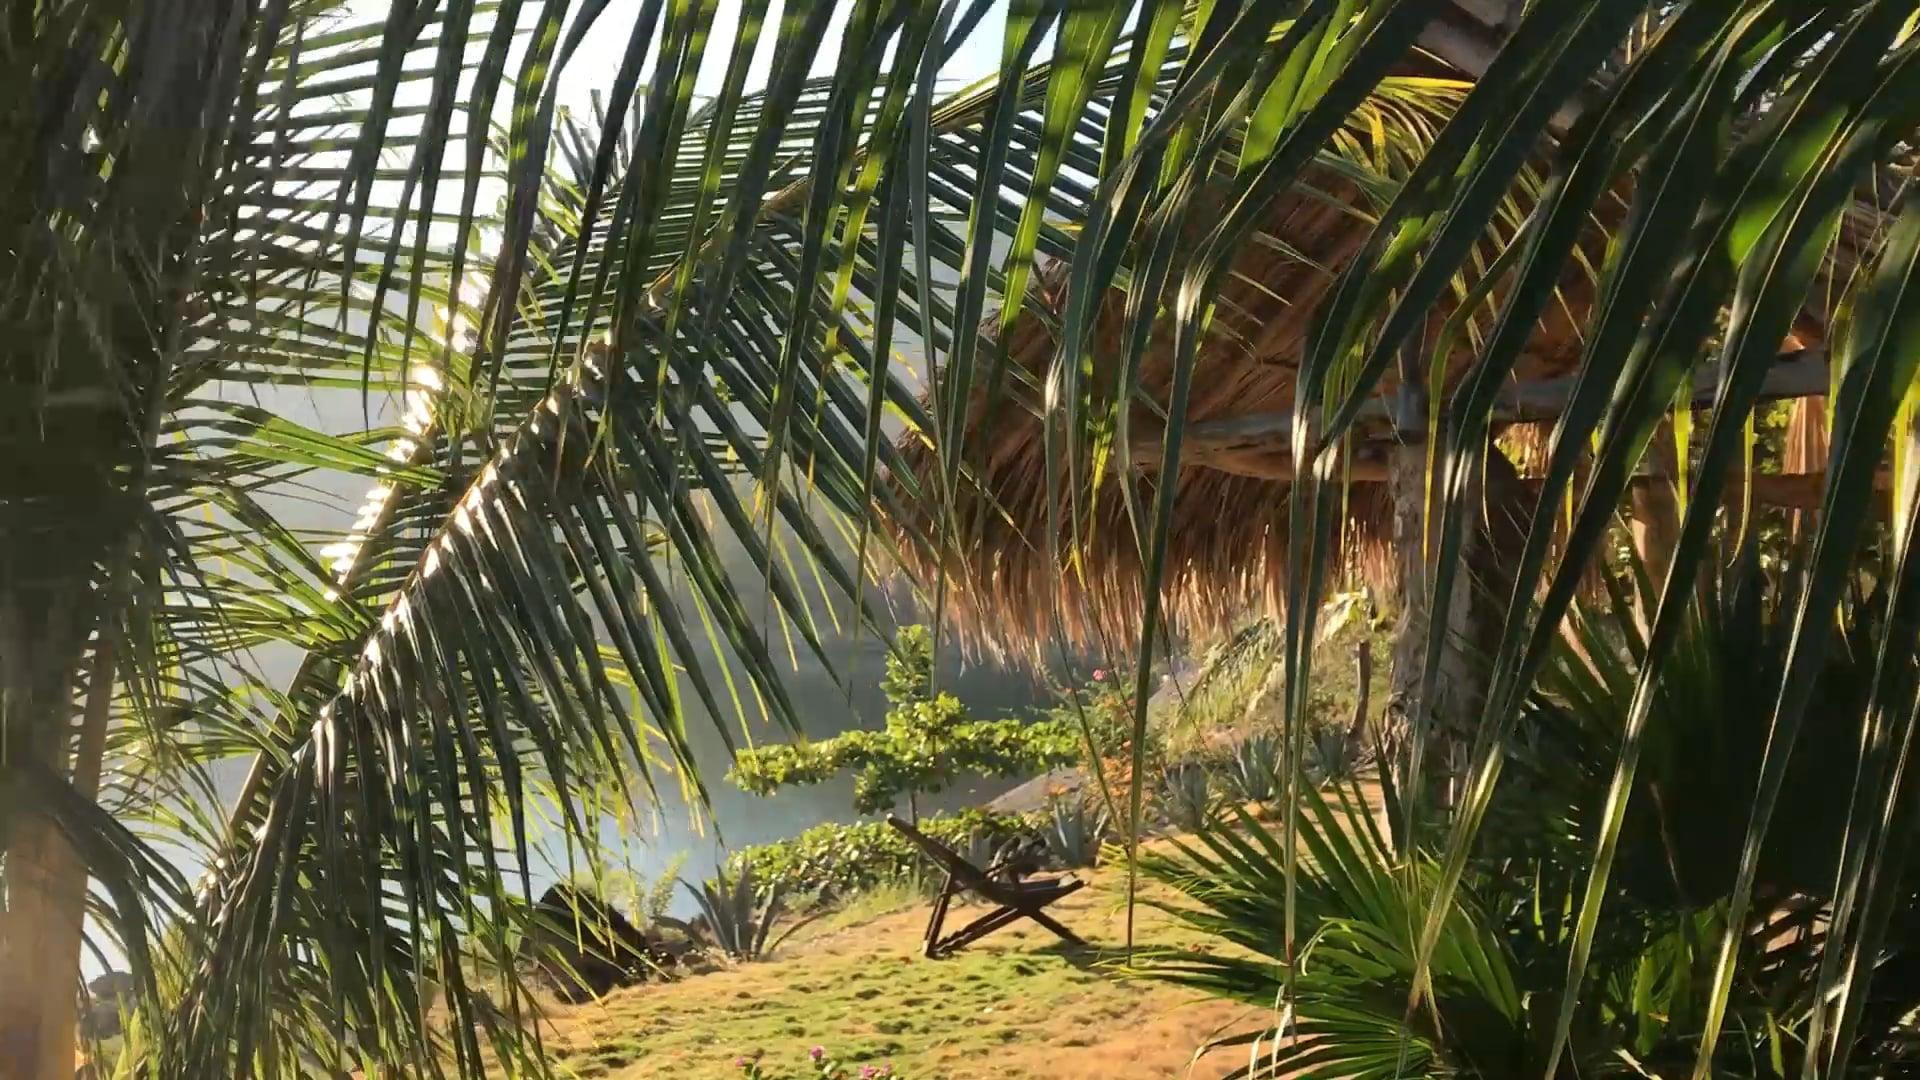 Chelsea's Yoga and Wellness Retreat - Apoyo Lodge in Nicaragua; February 2017